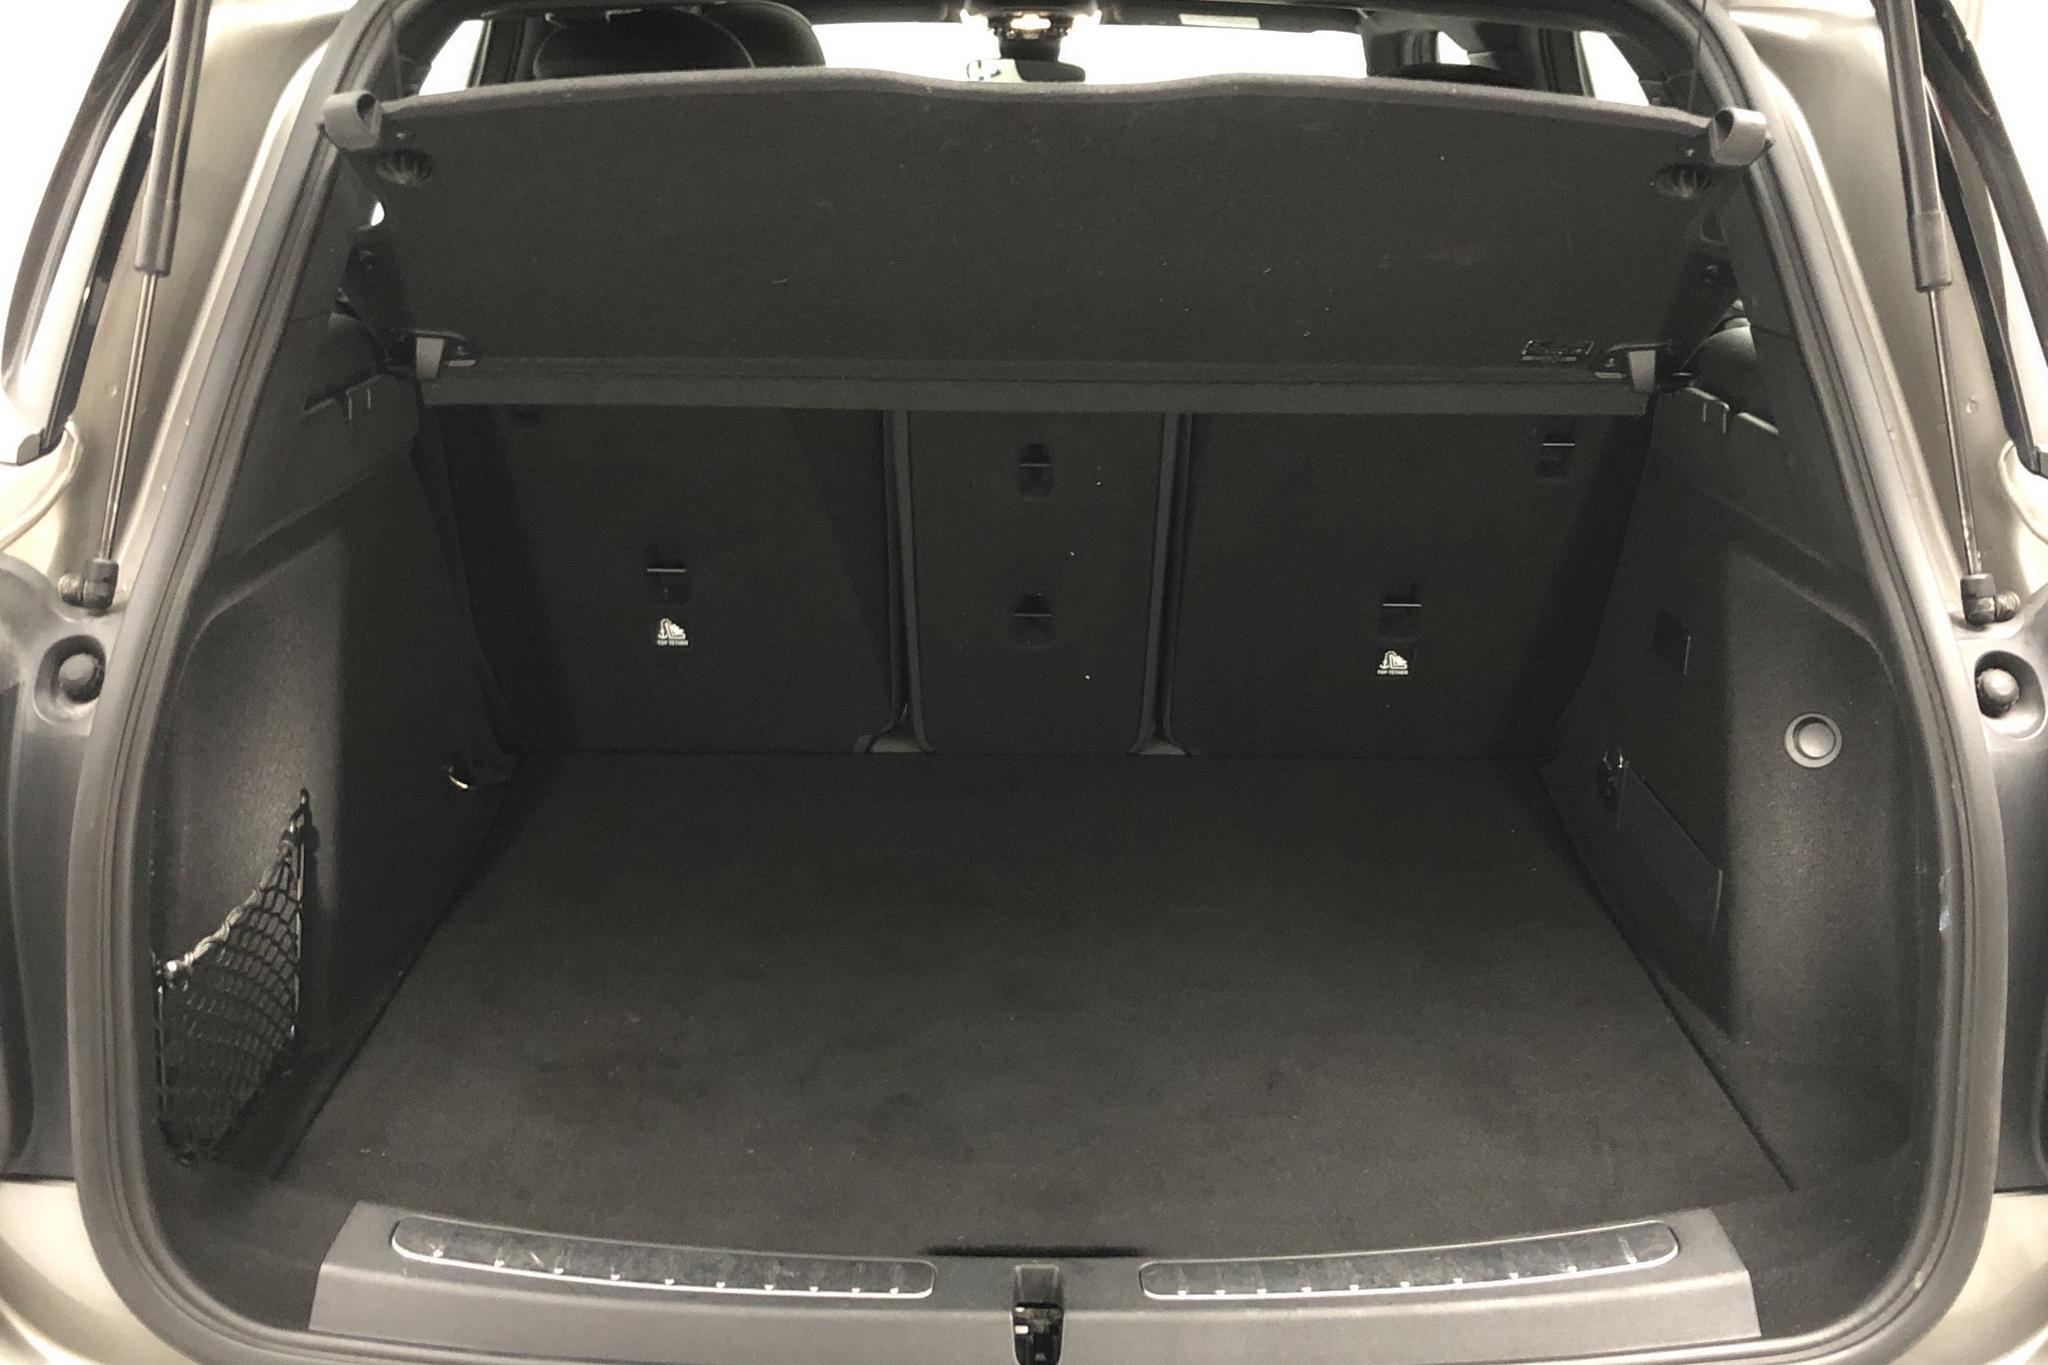 MINI Cooper S E ALL4 Countryman, F60 (224hk) - 7 207 mil - Automat - grå - 2019